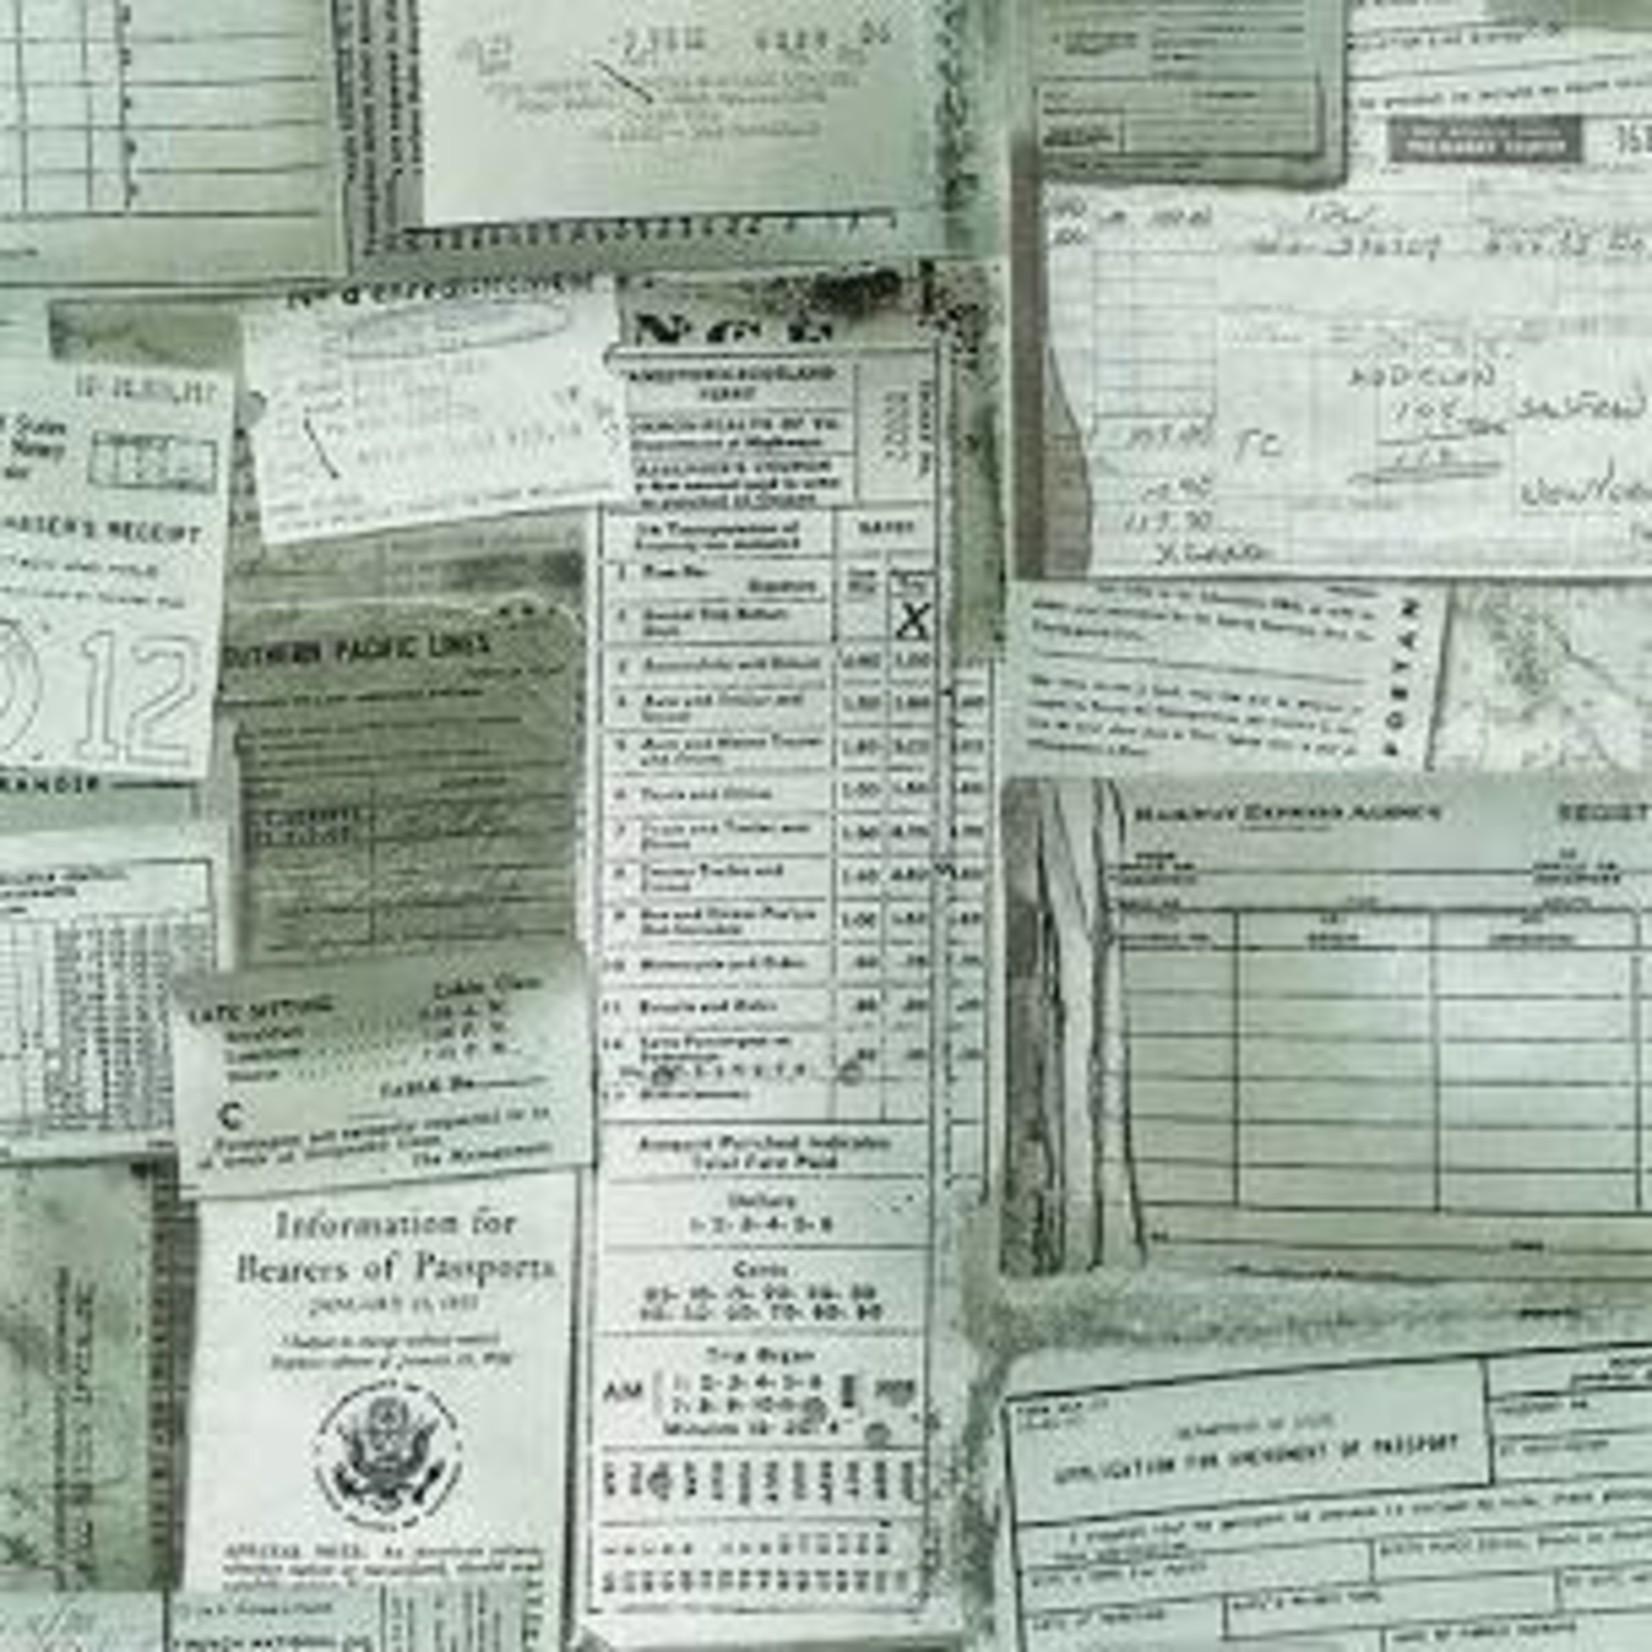 TIM HOLTZ DOCUMENTATION BY TIM HOLTZ $0.16 PER CM OR $16 PER METRE